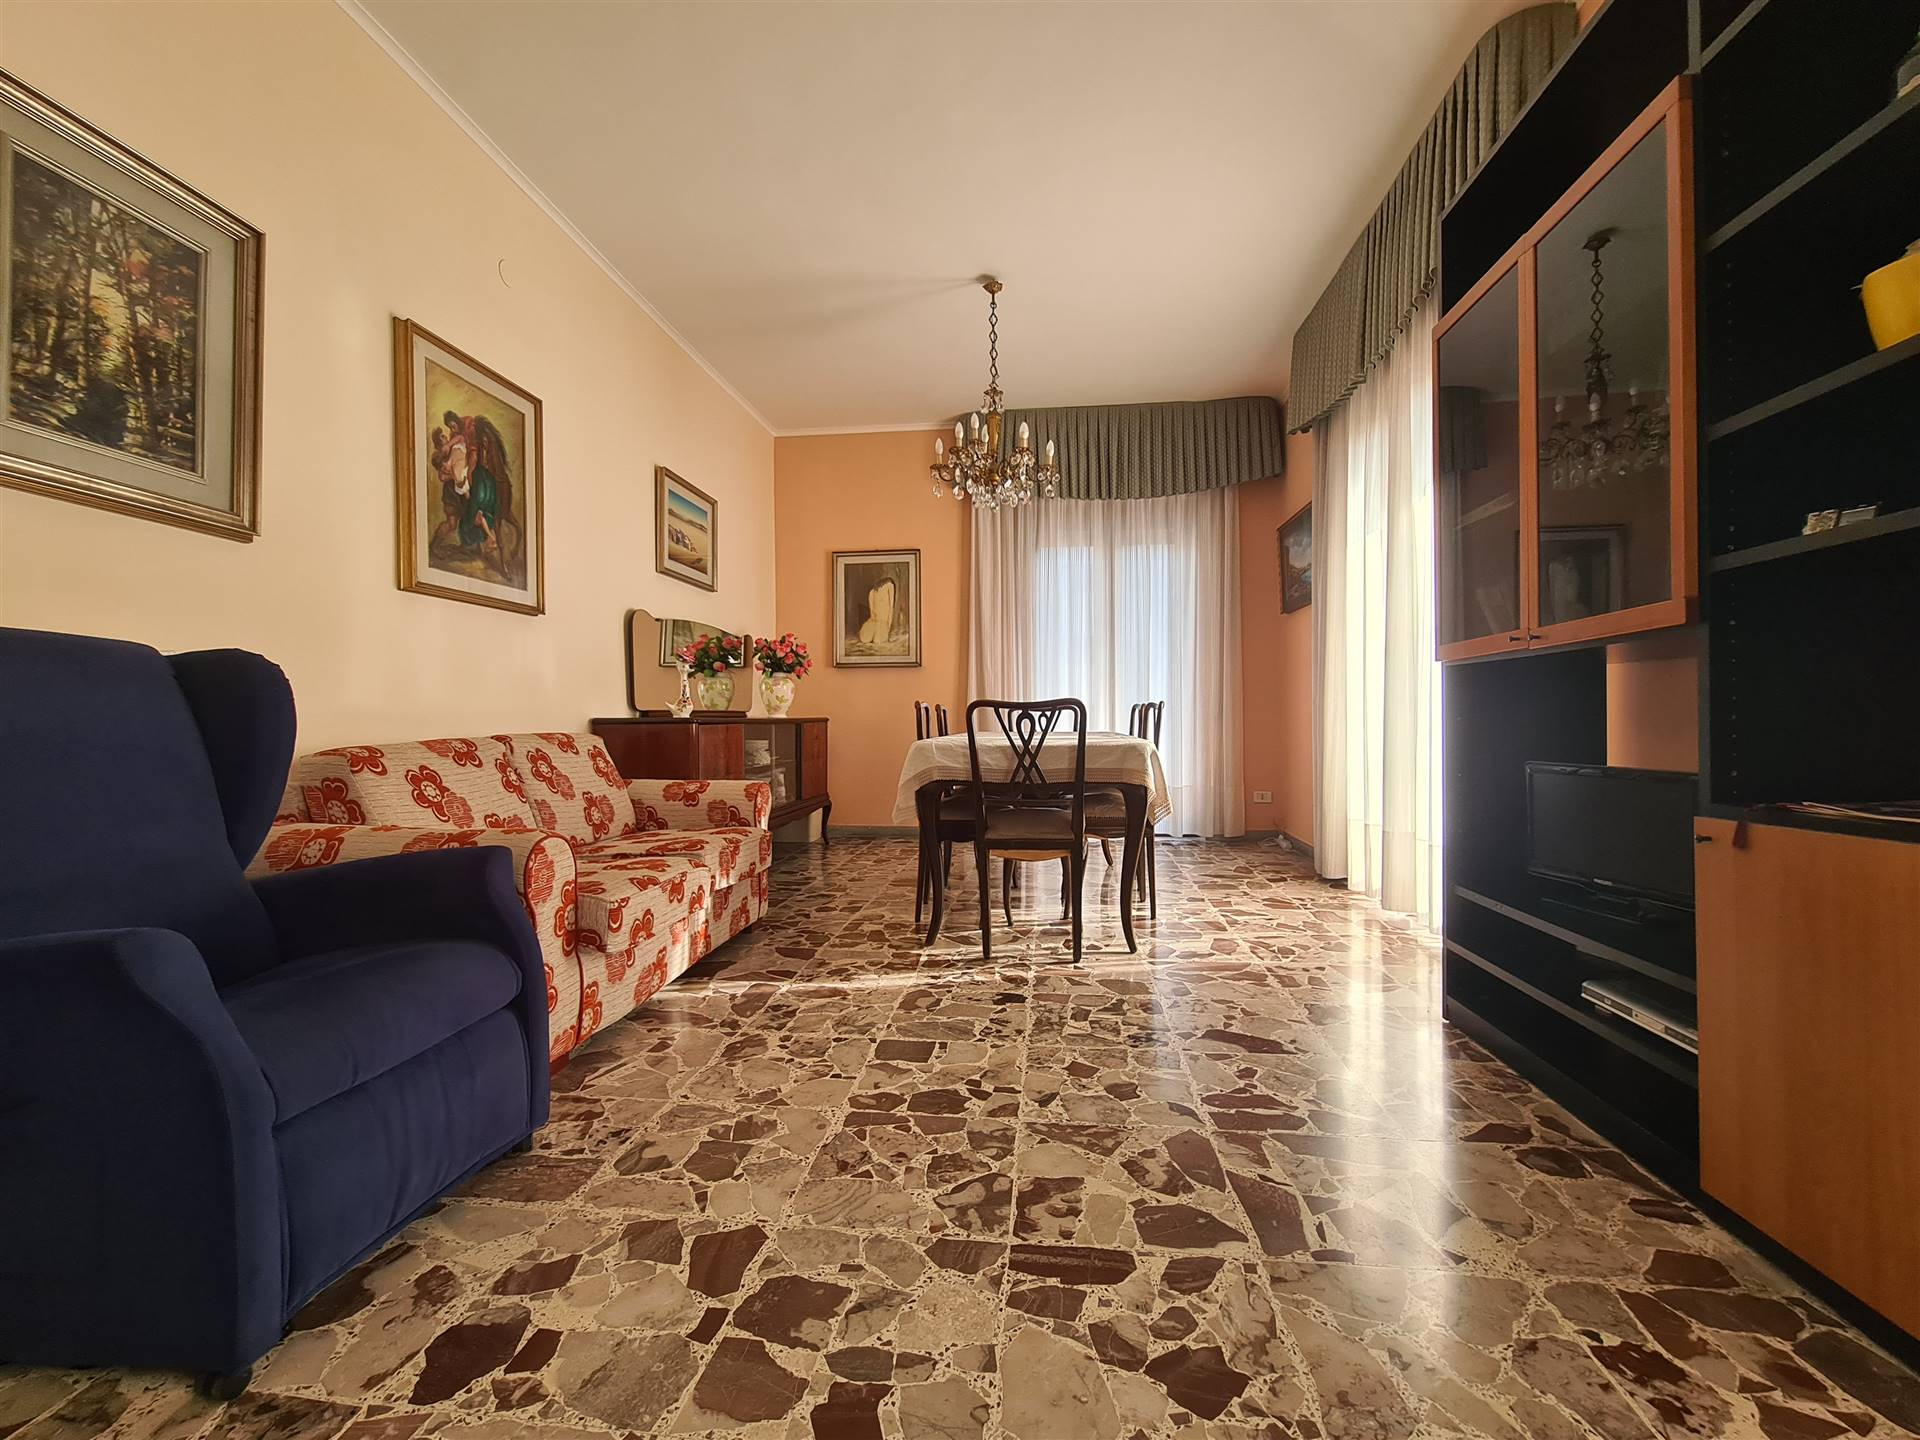 AV924A-Appartamento-SANTA-MARIA-CAPUA-VETERE-Via-Luigi-De-Michele